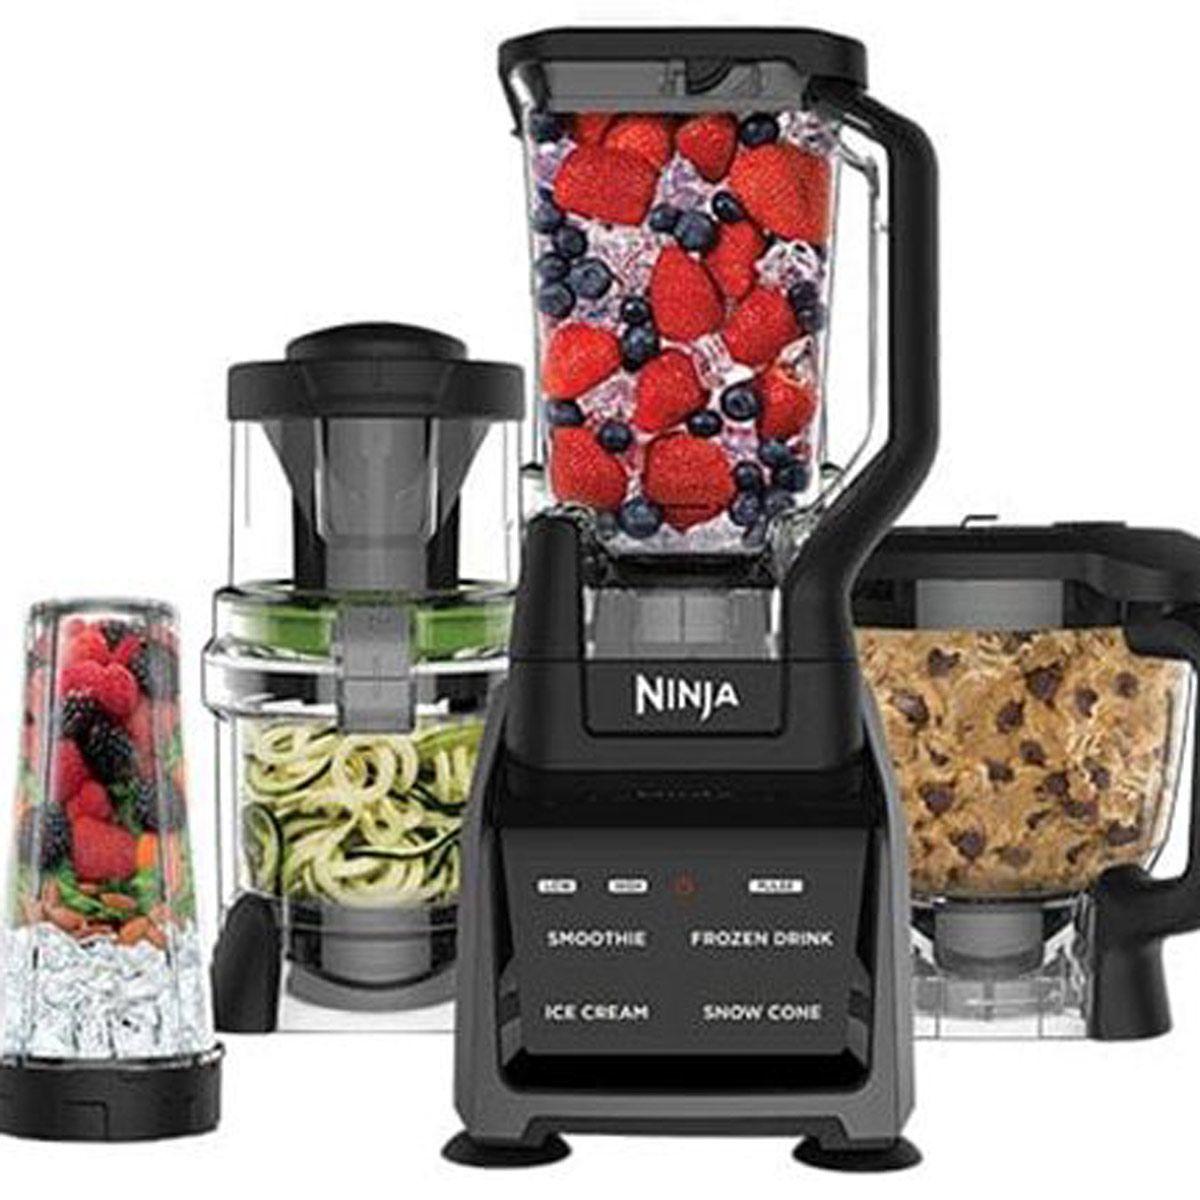 ninja blender food processor intellisense system (ct682)